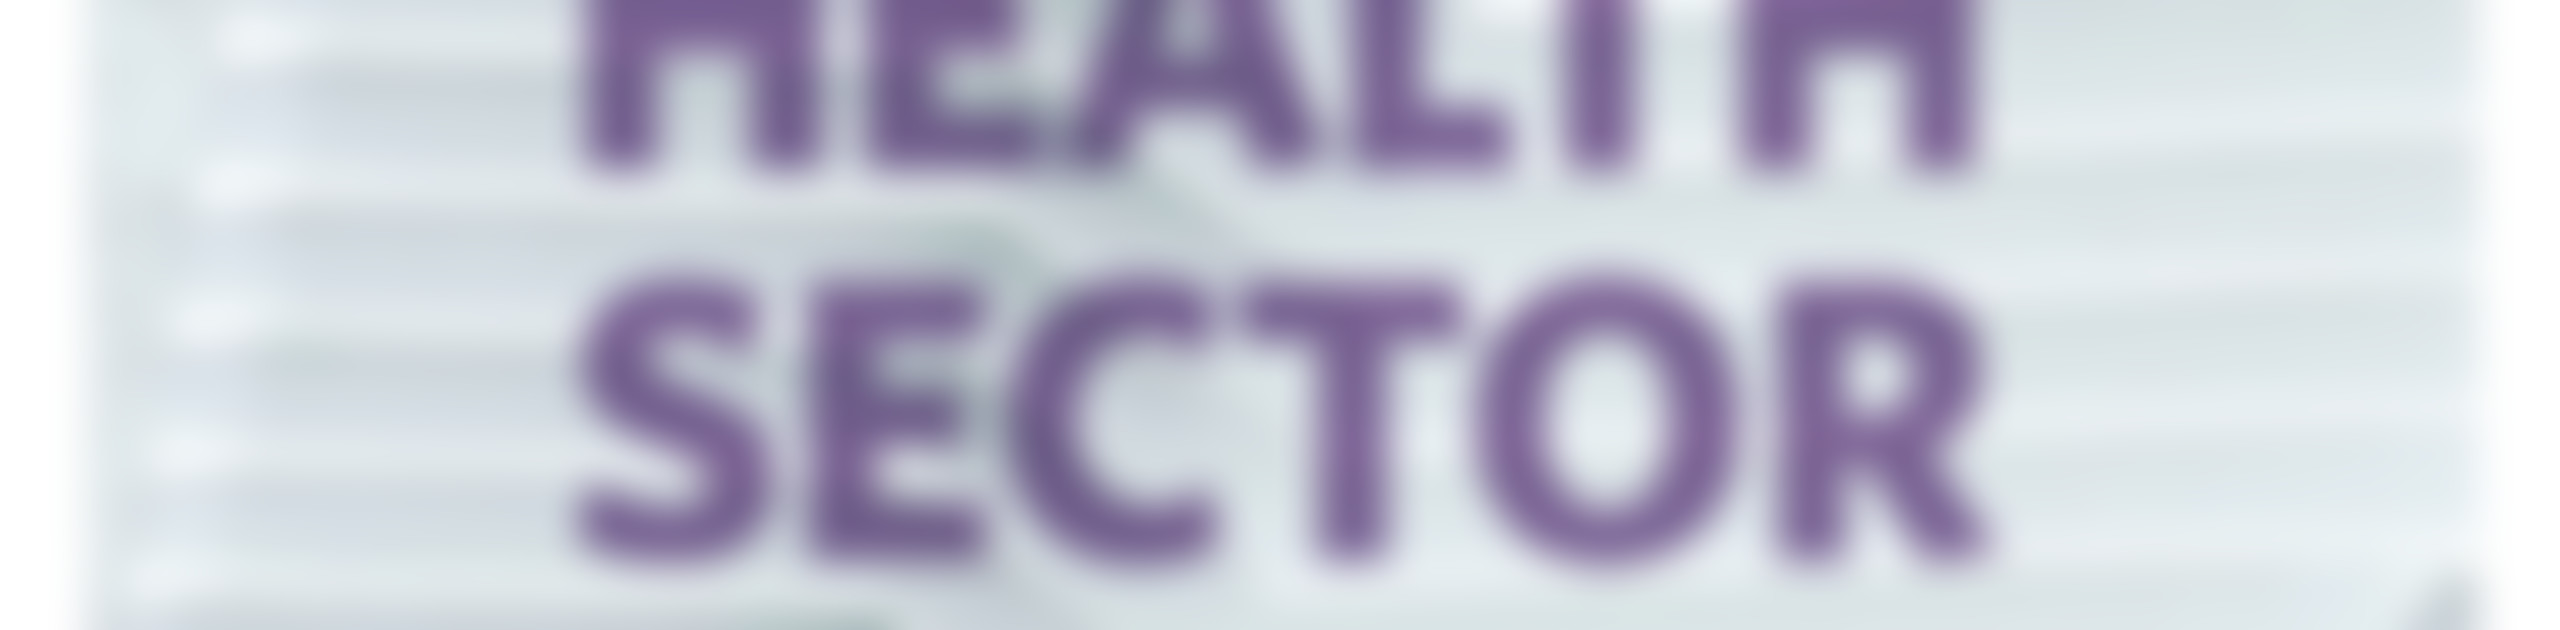 『Service Design Impact Report : Health Sector(jp)』日本語版、2018年9月公開予定